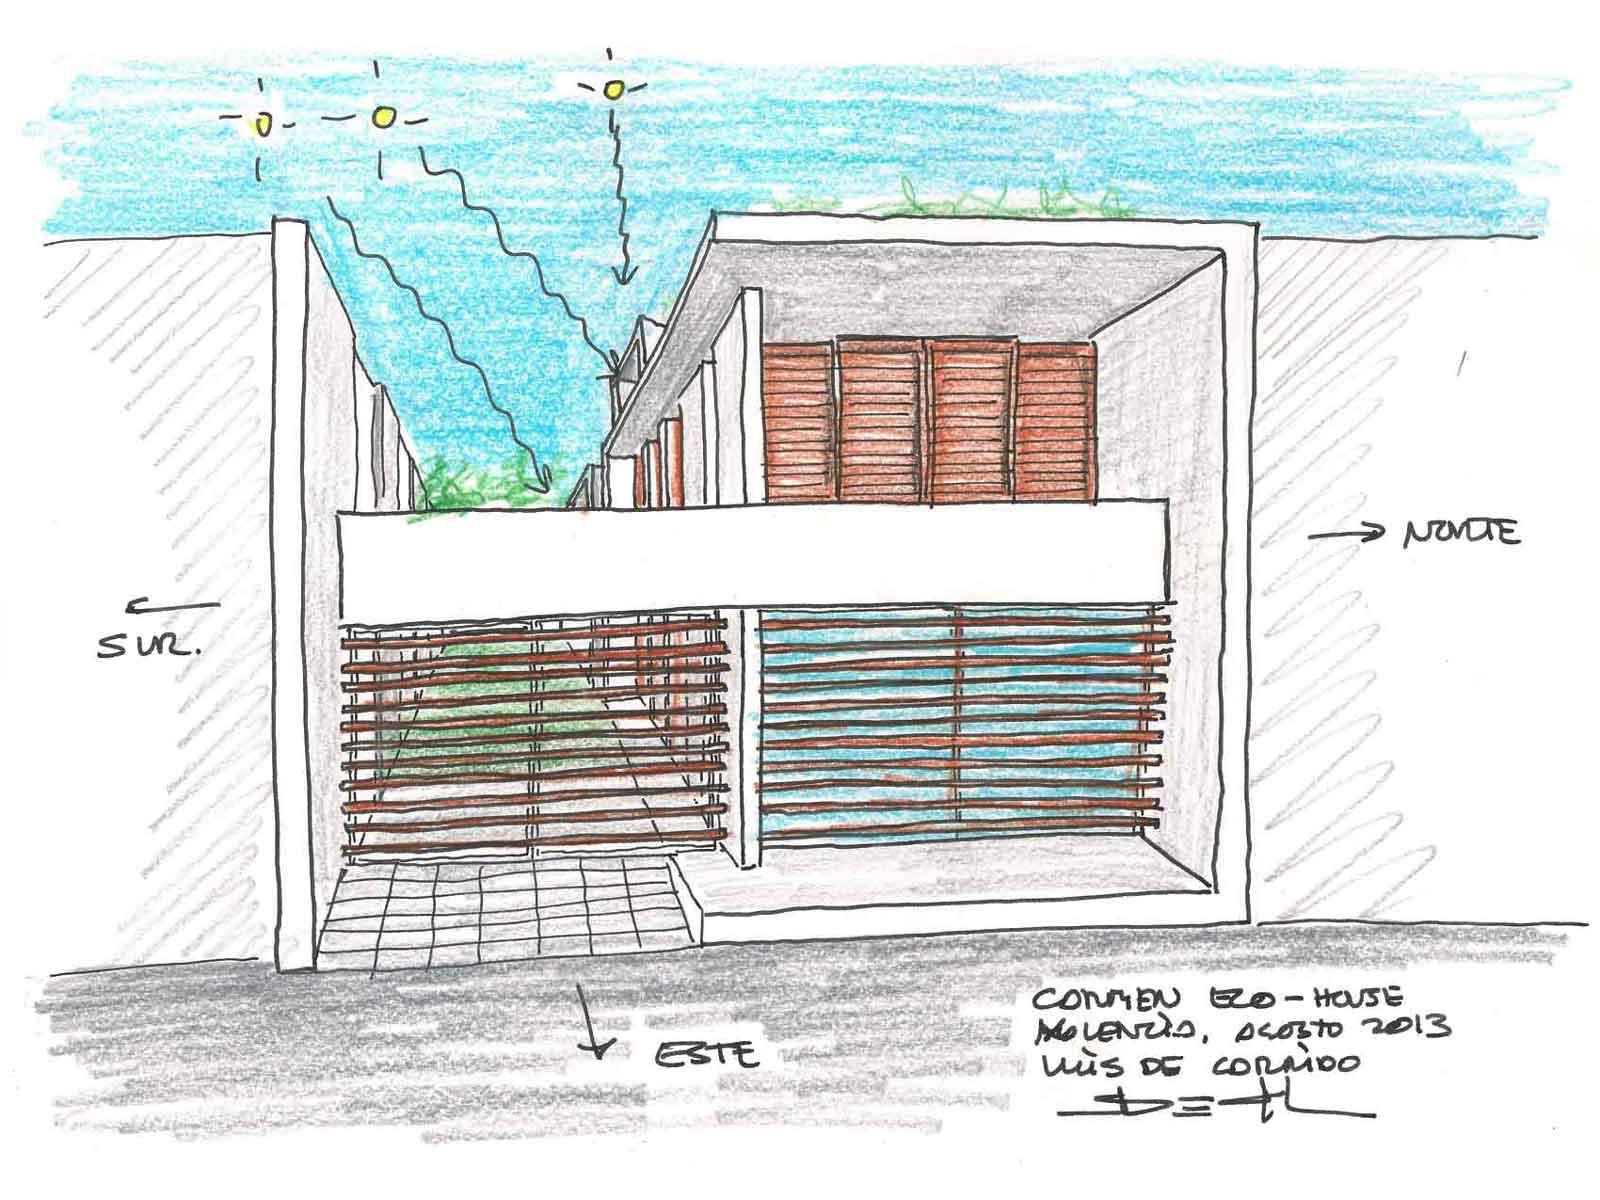 161027_carmen-eco-house-boceto-baja